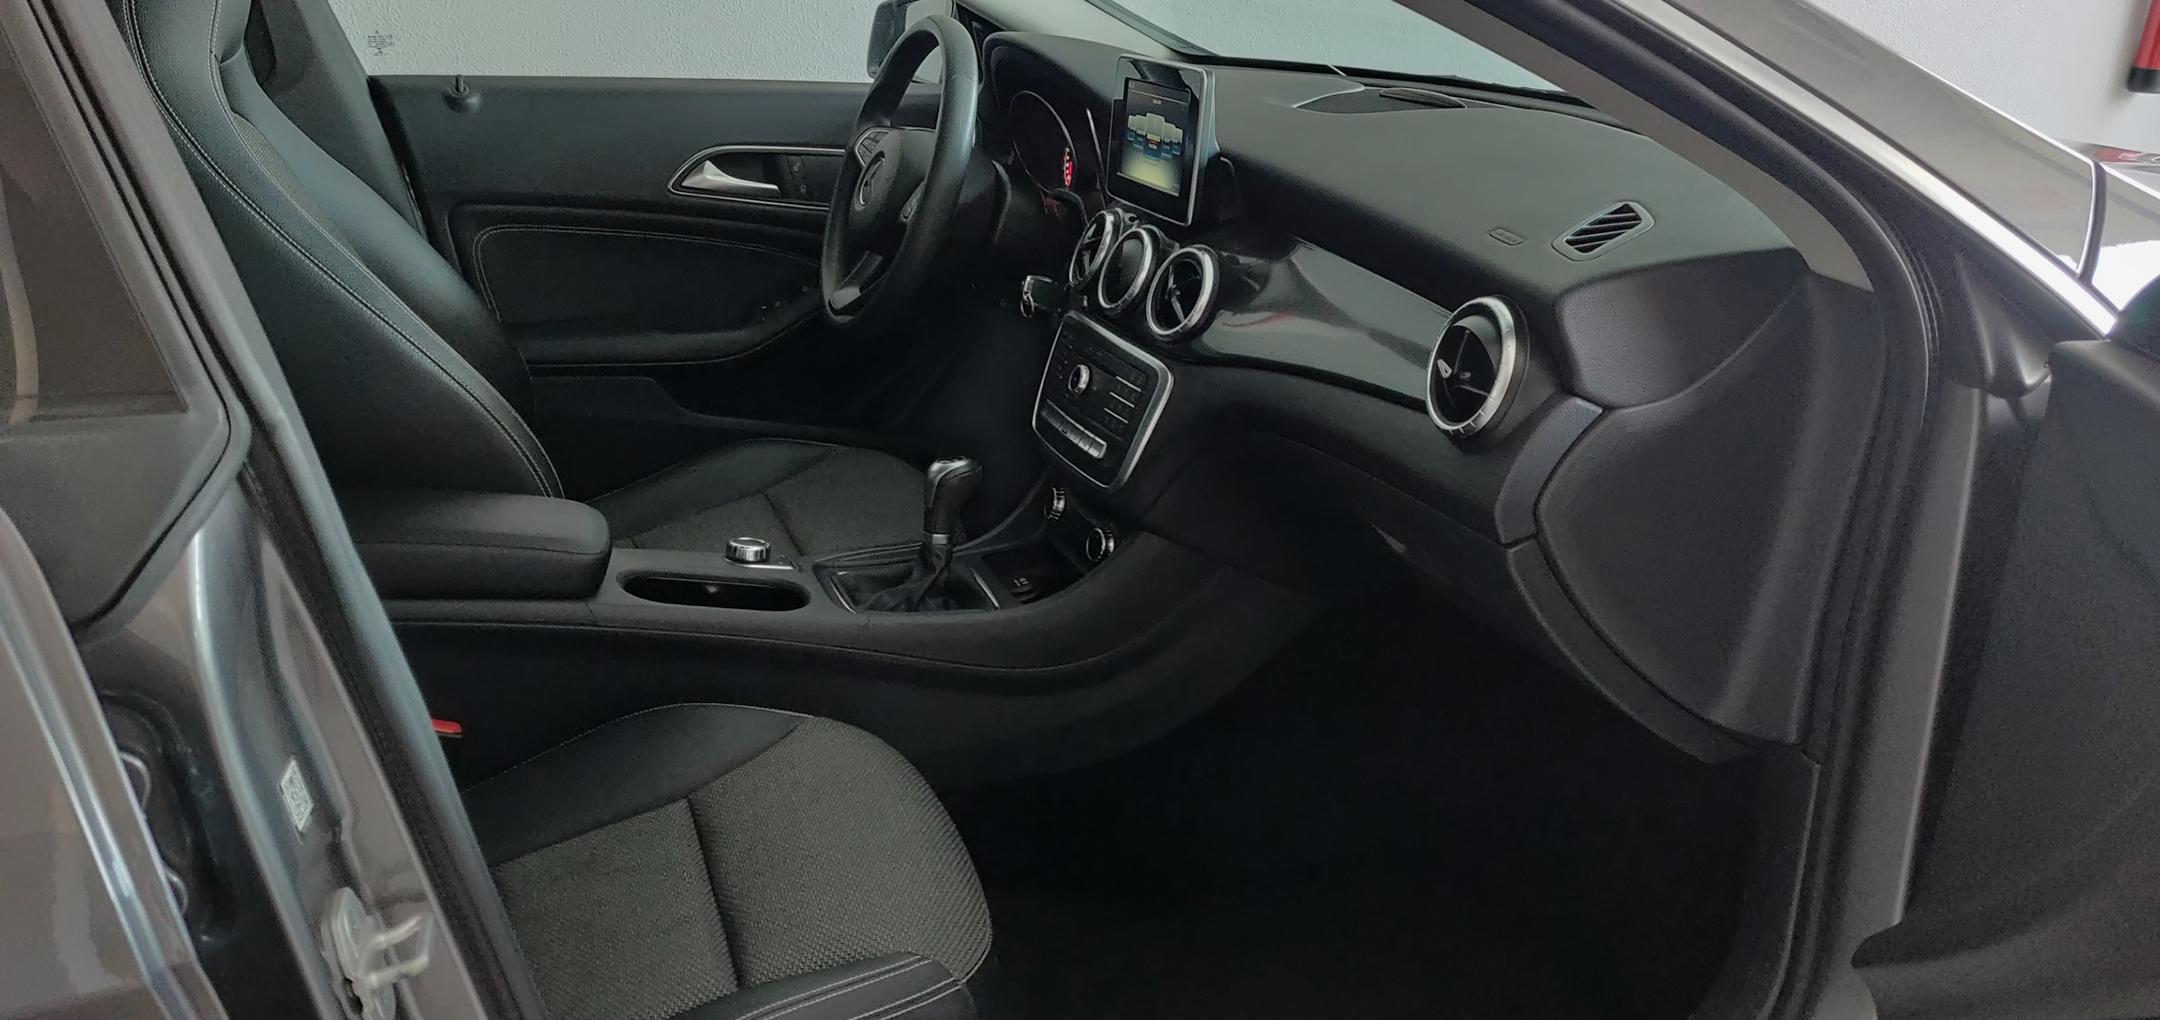 Mercedes-Benz CLA 180 1.5 Style | Imagem 4